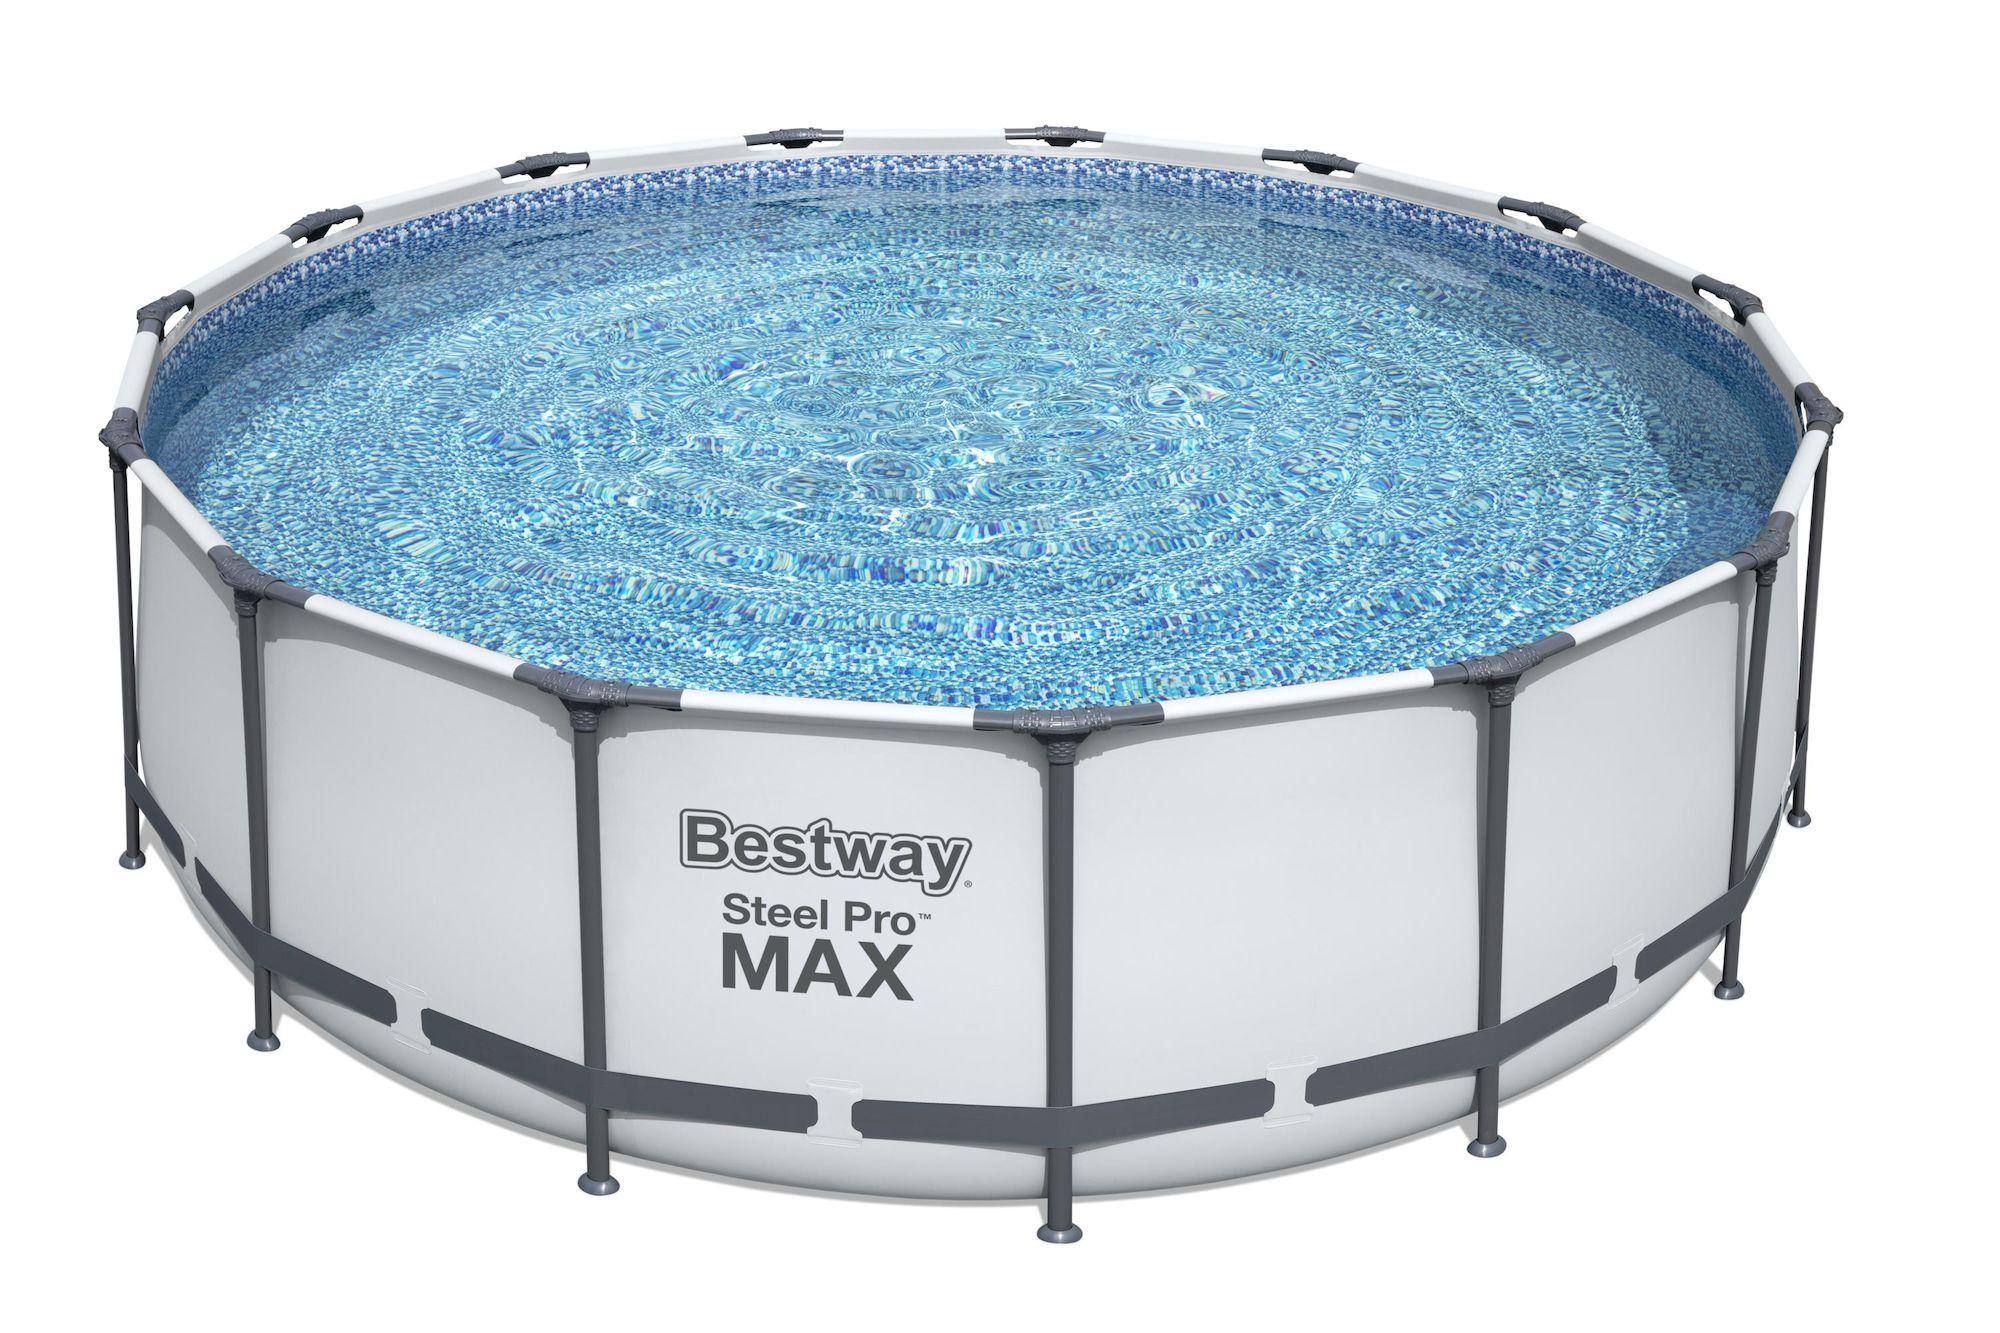 Bestway Steel Pro MAX Pool m. Tillbehör 4.57m x 1.22m